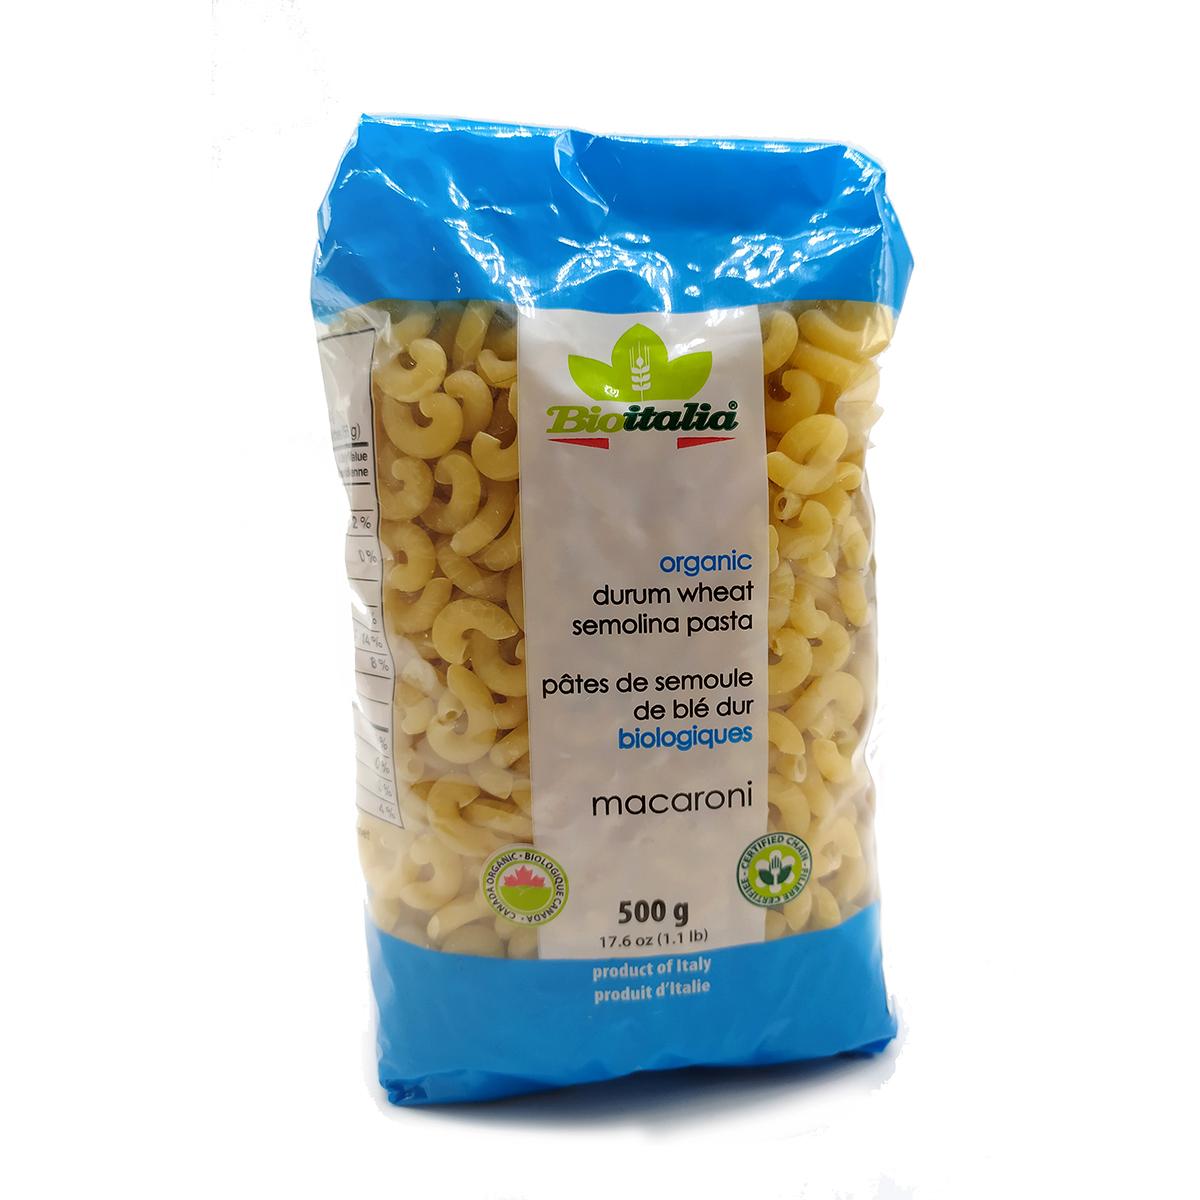 Nui macaroni hữu cơ 500g